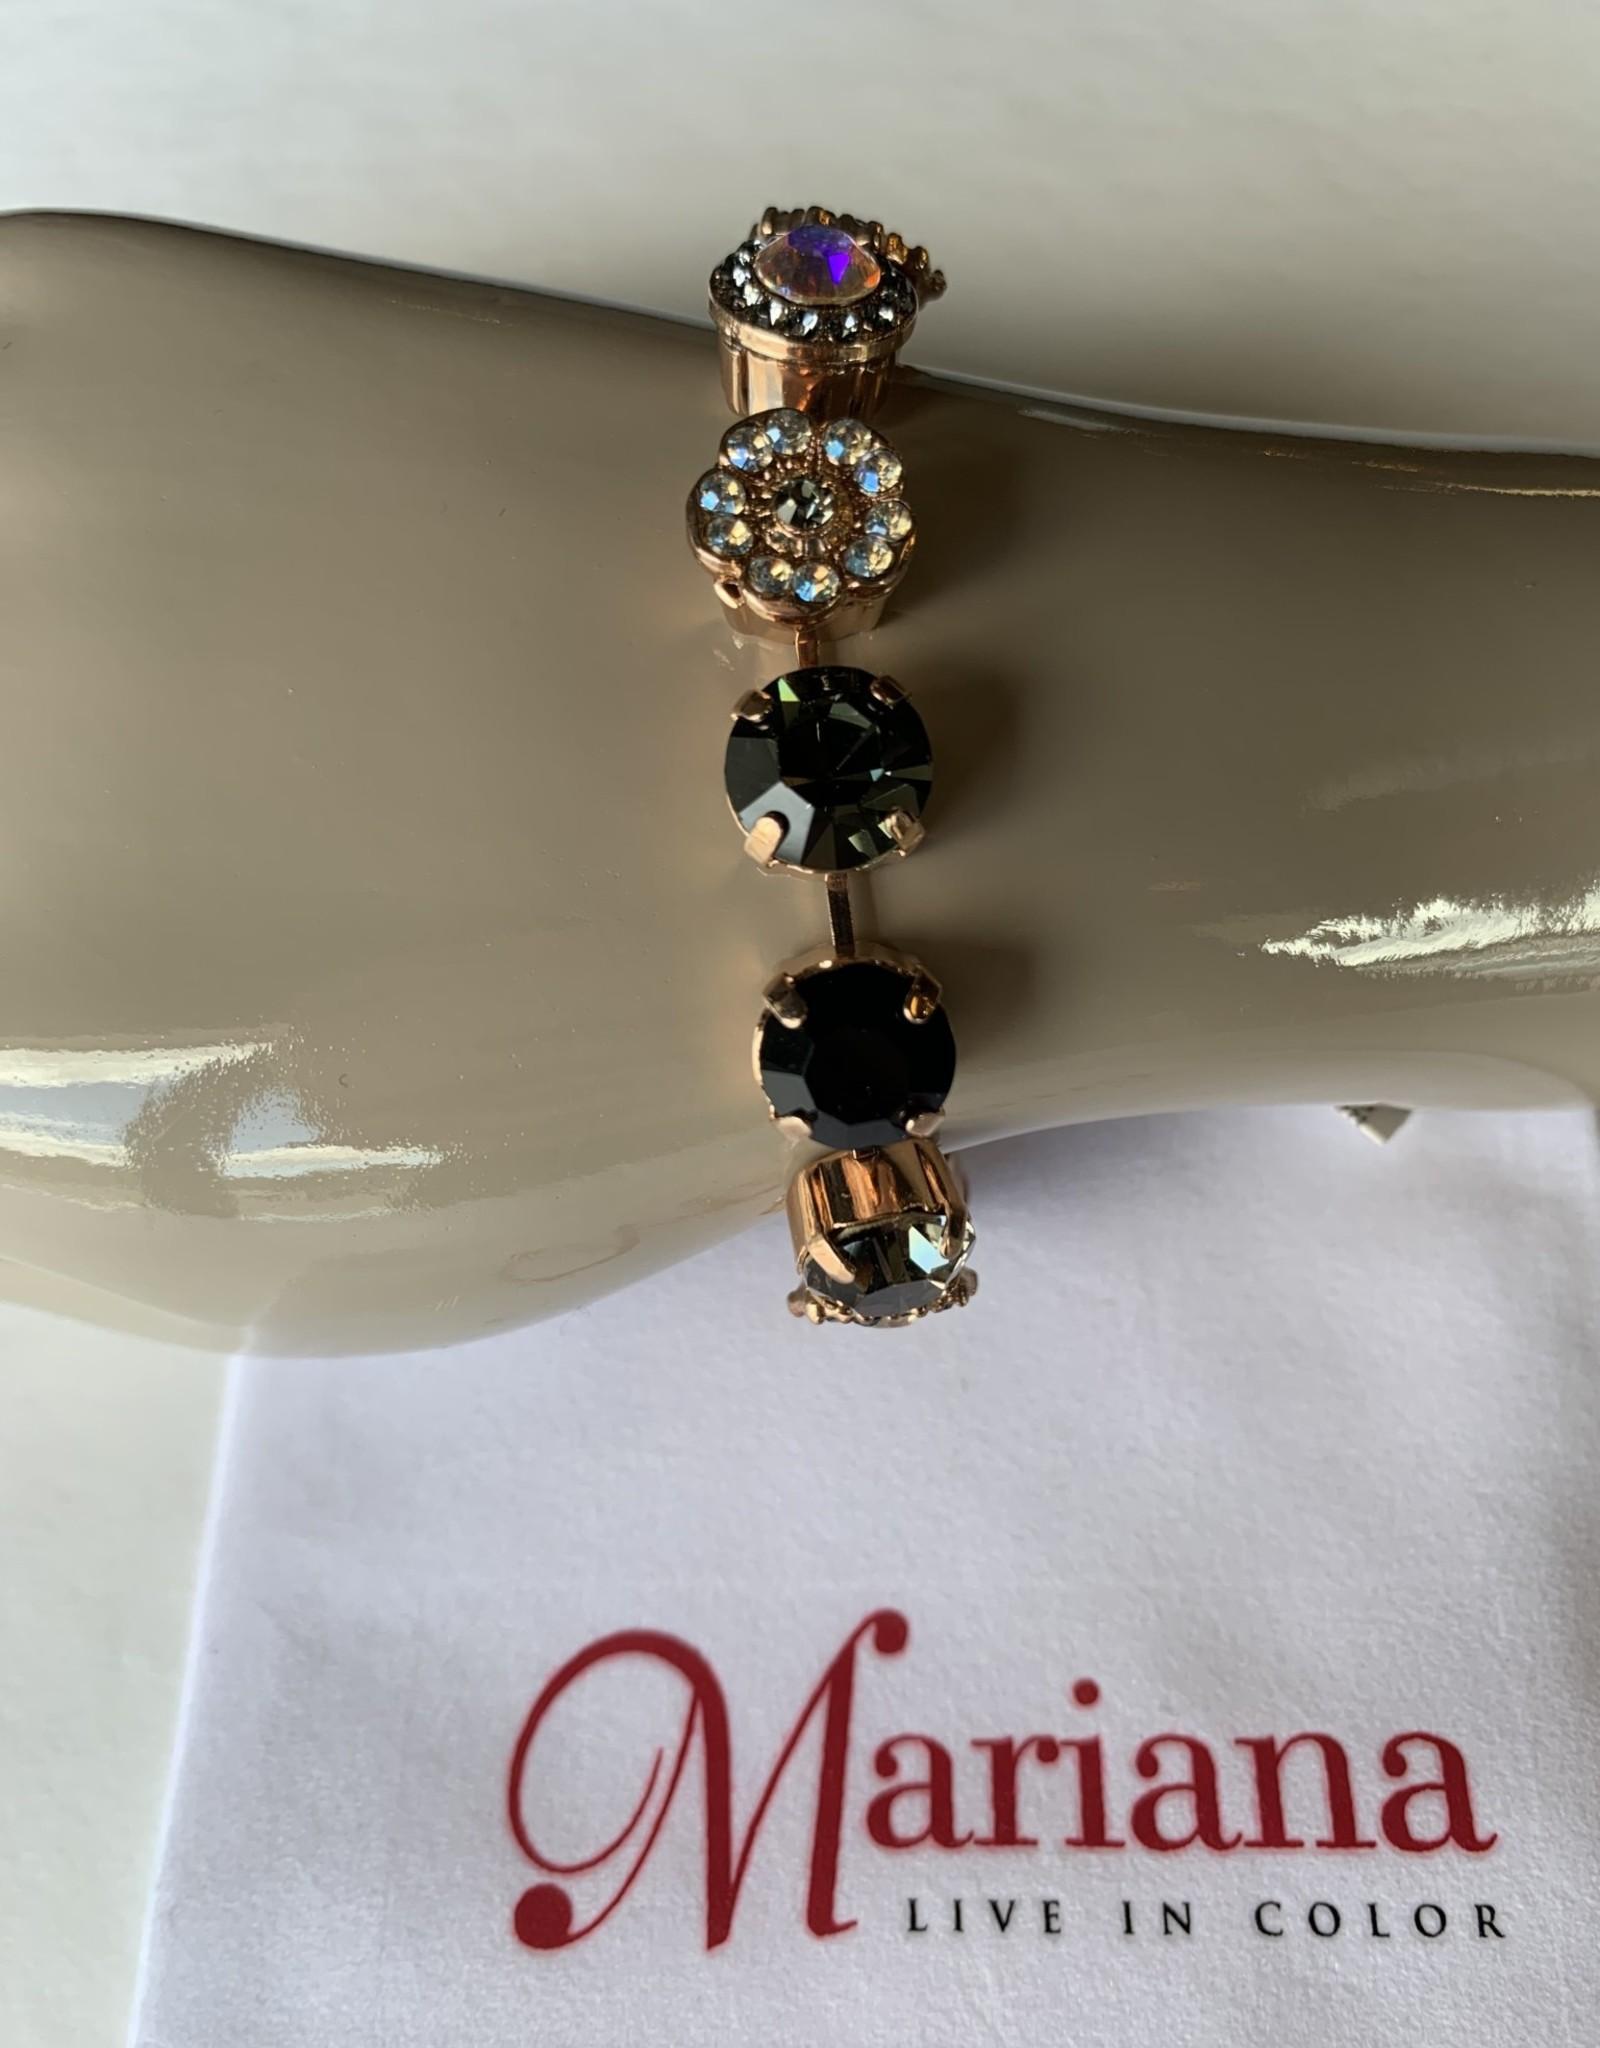 Mariana Bracelet Mariana B-4084 Fleurs avec Cristaux Swarovski Noir/Khaki/Gold 1094-RG